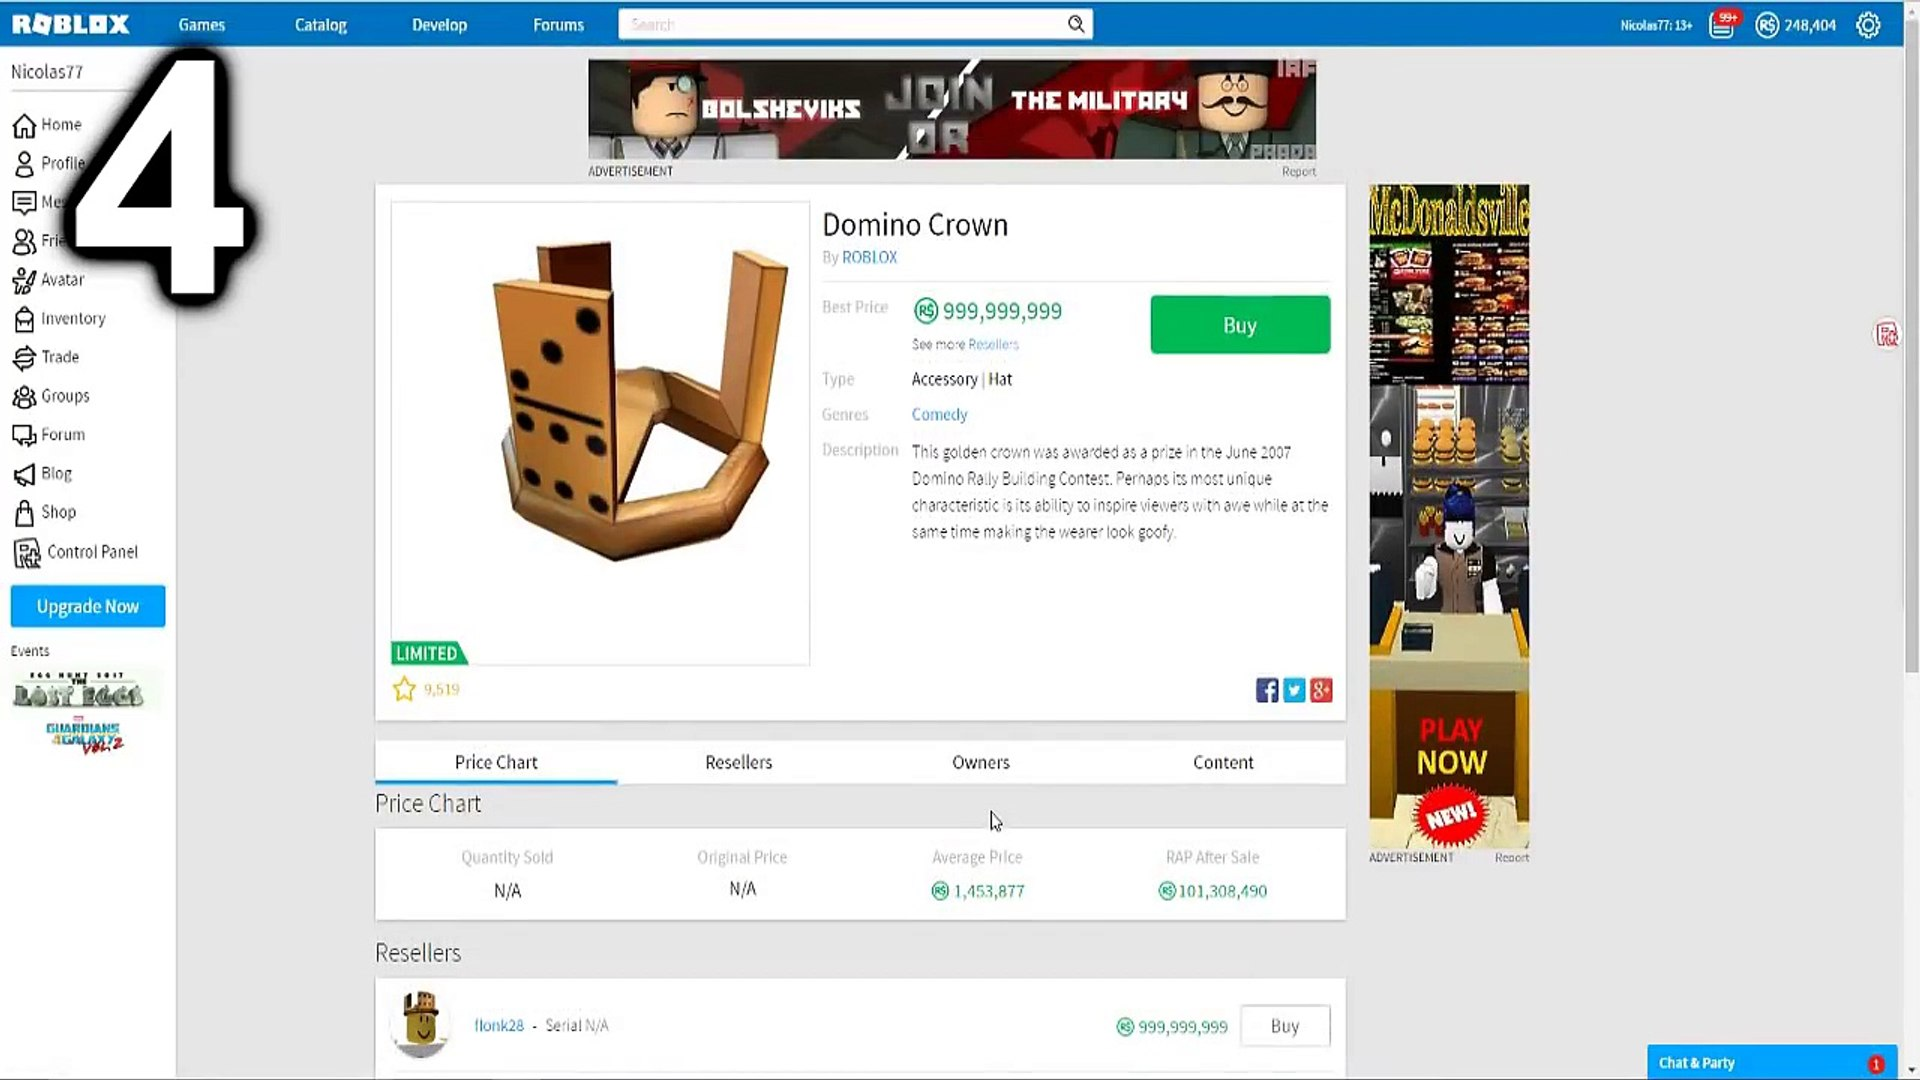 Top 10 Free Roblox Games Wholefedorg Male Robux Vbucksgenerator2019 Net